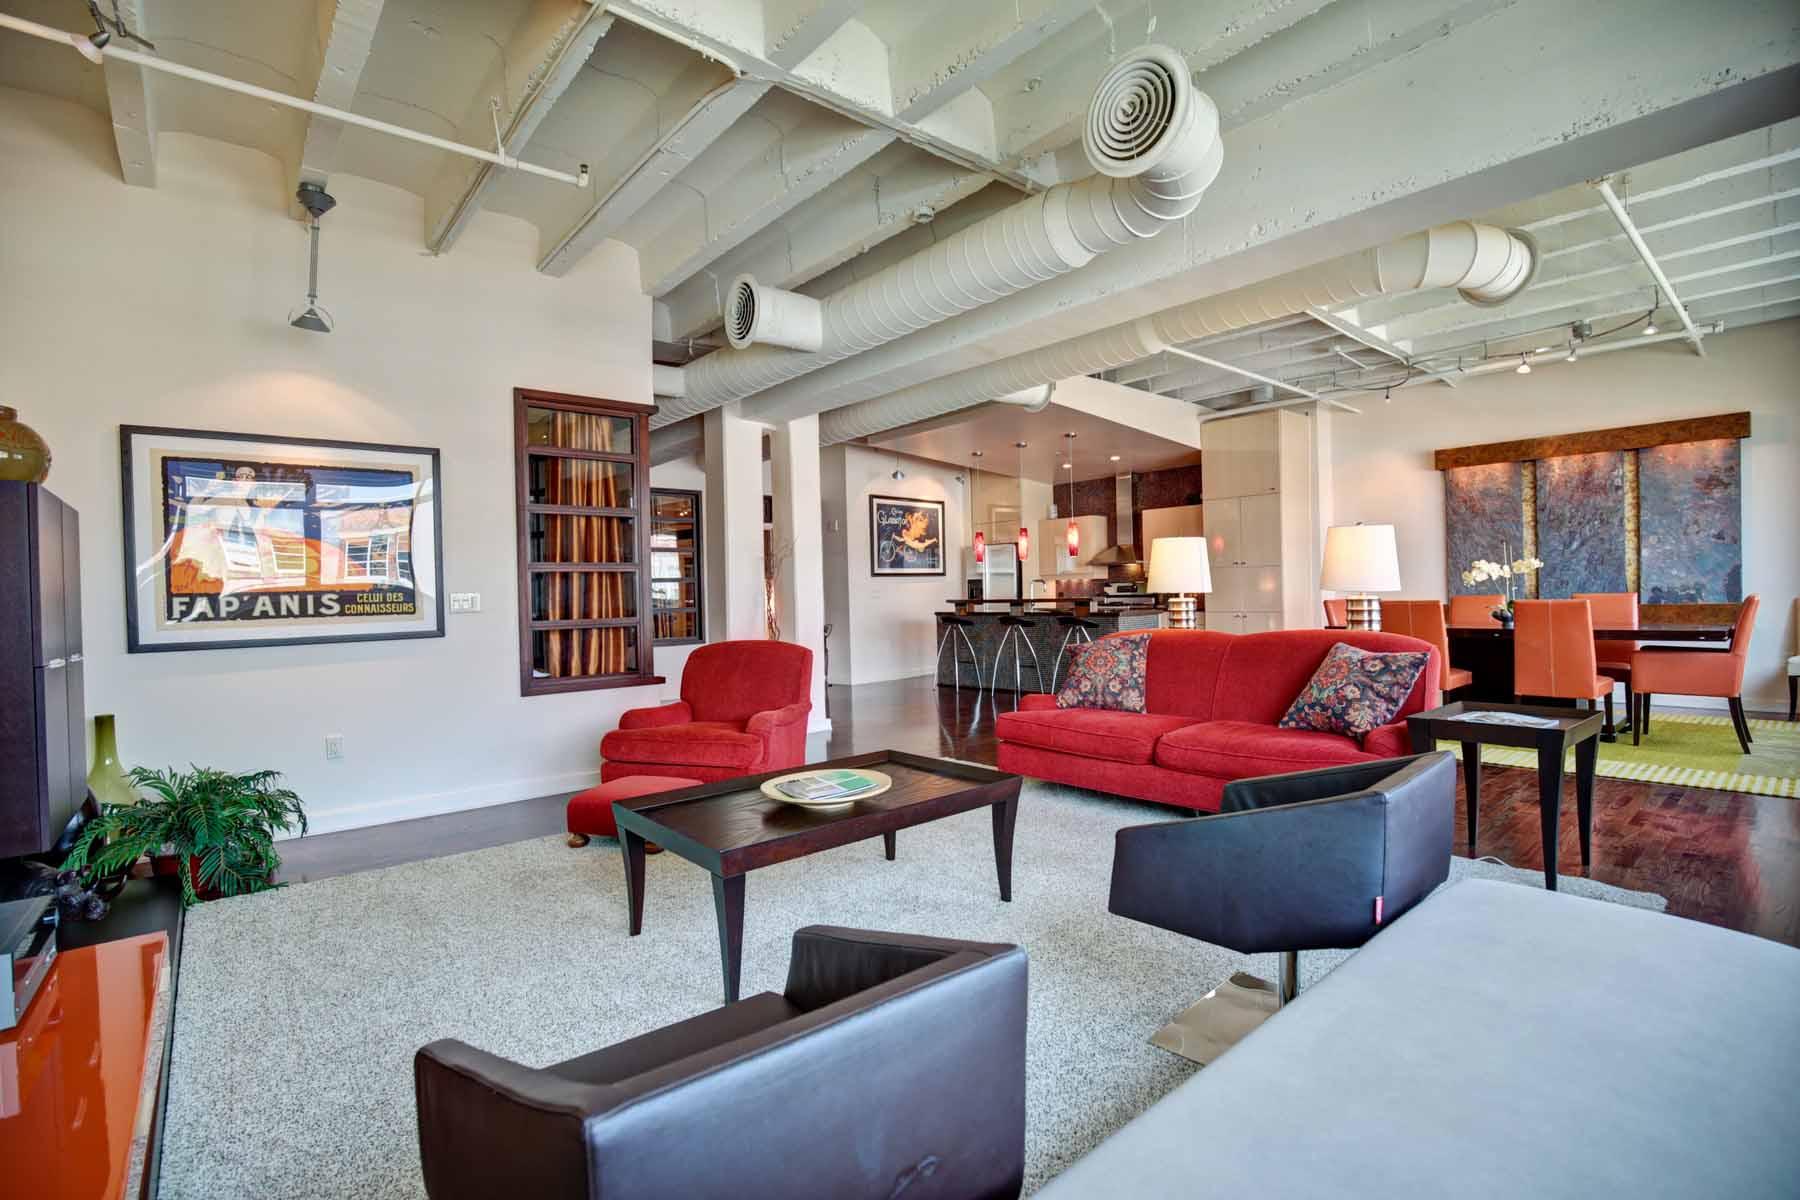 獨棟家庭住宅 為 出售 在 Truly One-of-A-Kind Penthouse Level Home in the Midtown Mile 805 Peachtree Street NE Unit 614 Atlanta, 喬治亞州, 30308 美國